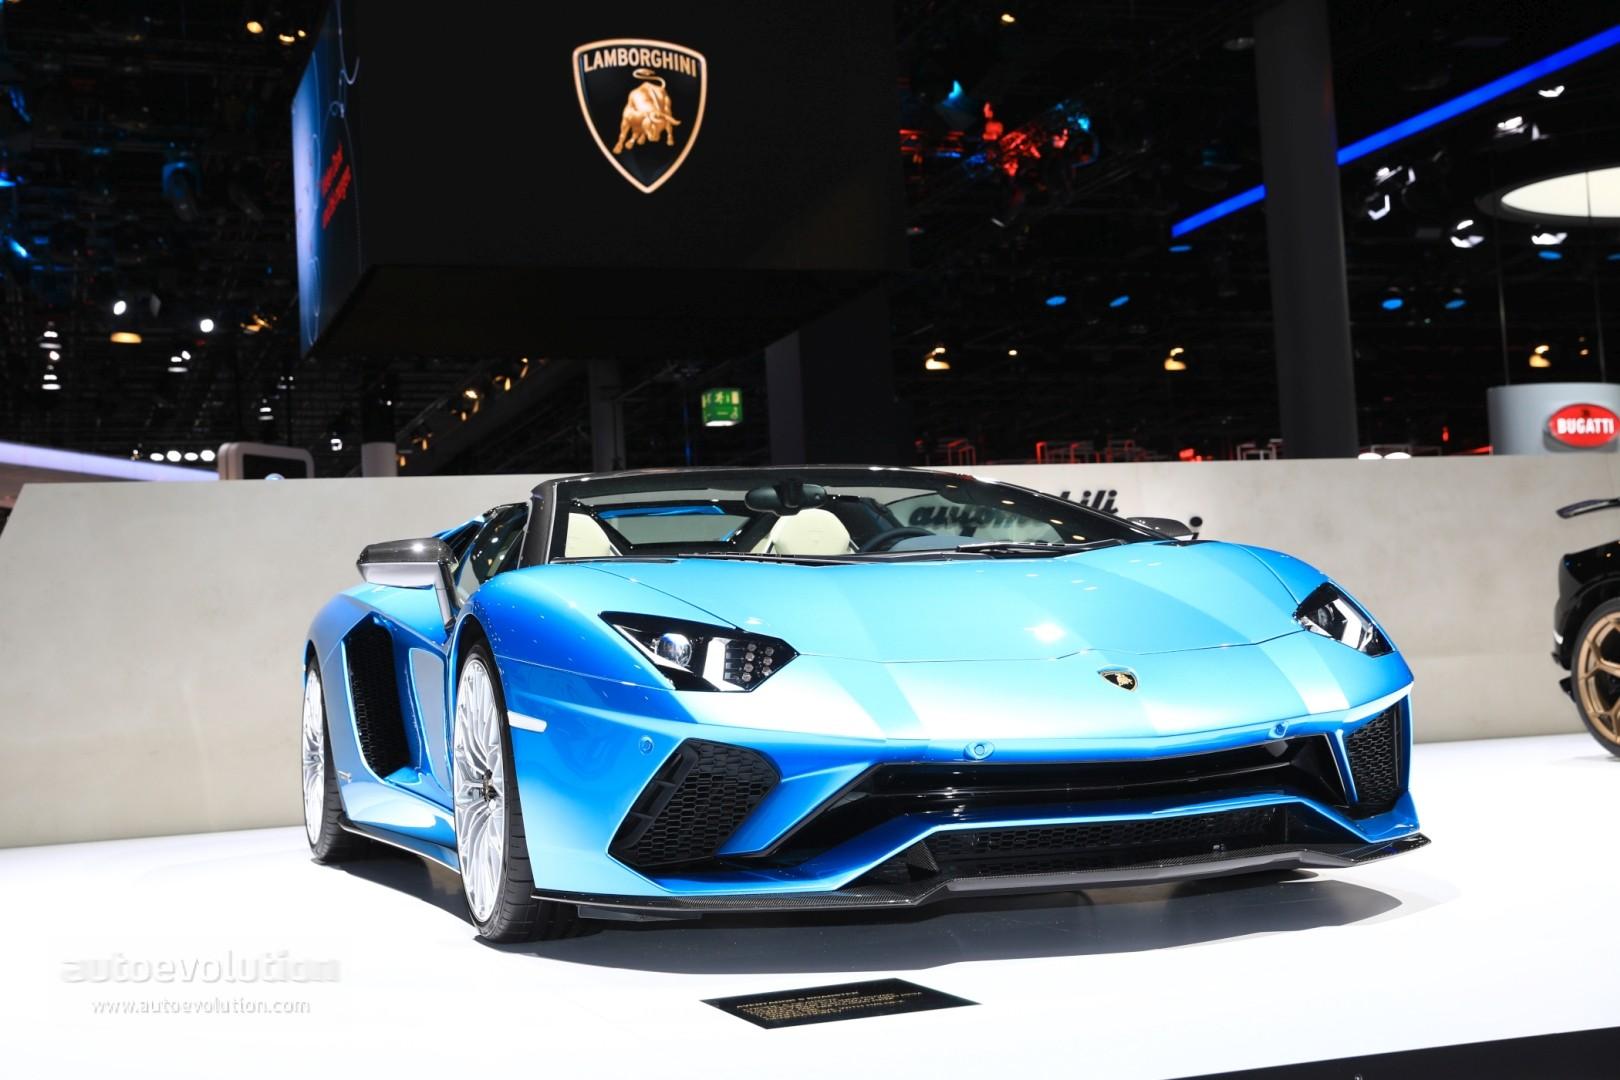 2018 Lamborghini Aventador S Roadster Rendered As The